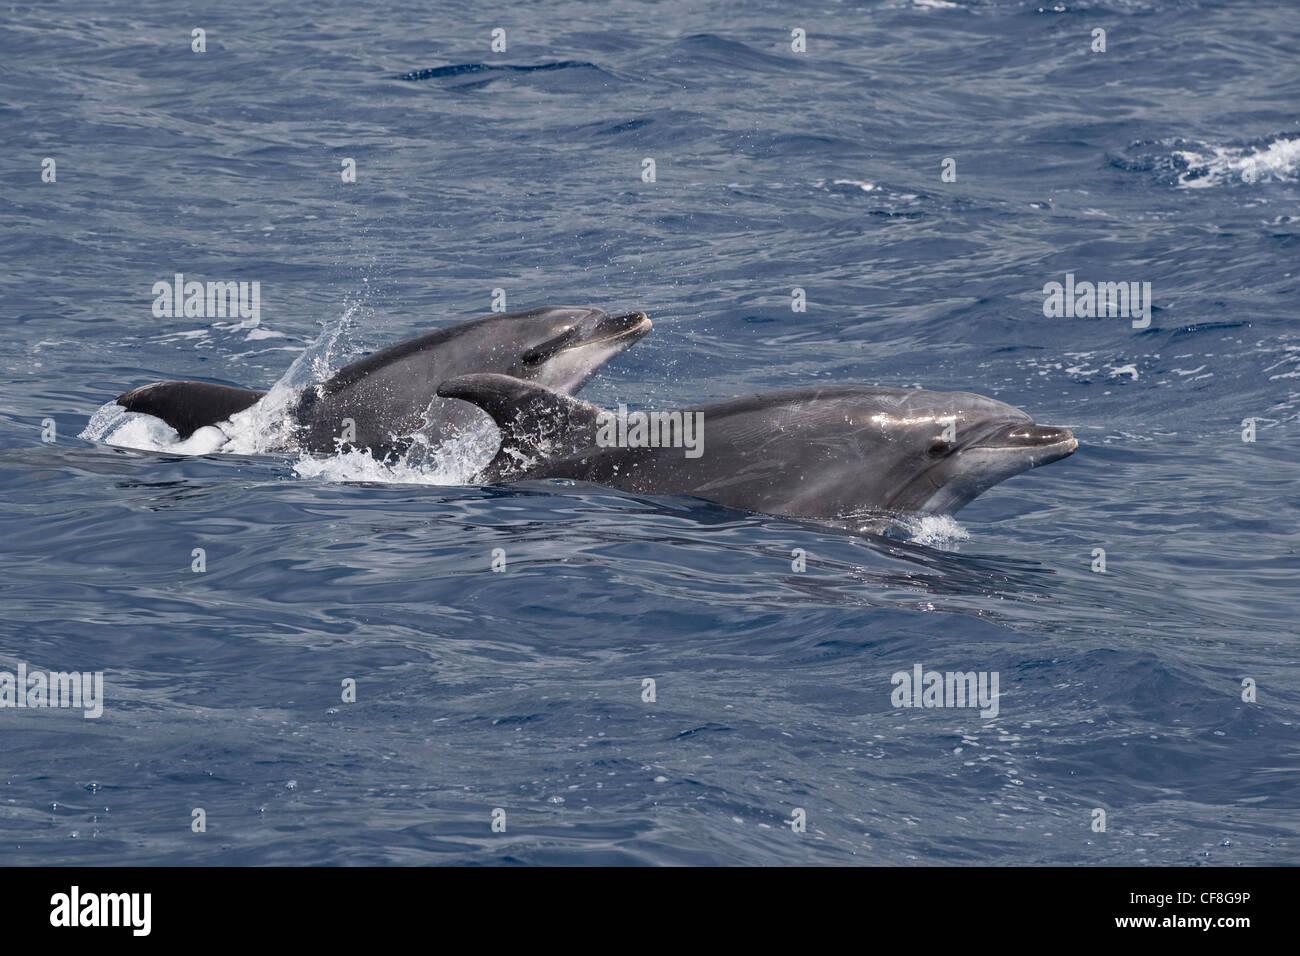 Common Bottlenose Dolphins (Tursiops truncatus) two adult animals porpoising. Azores, Atlantic Ocean. - Stock Image